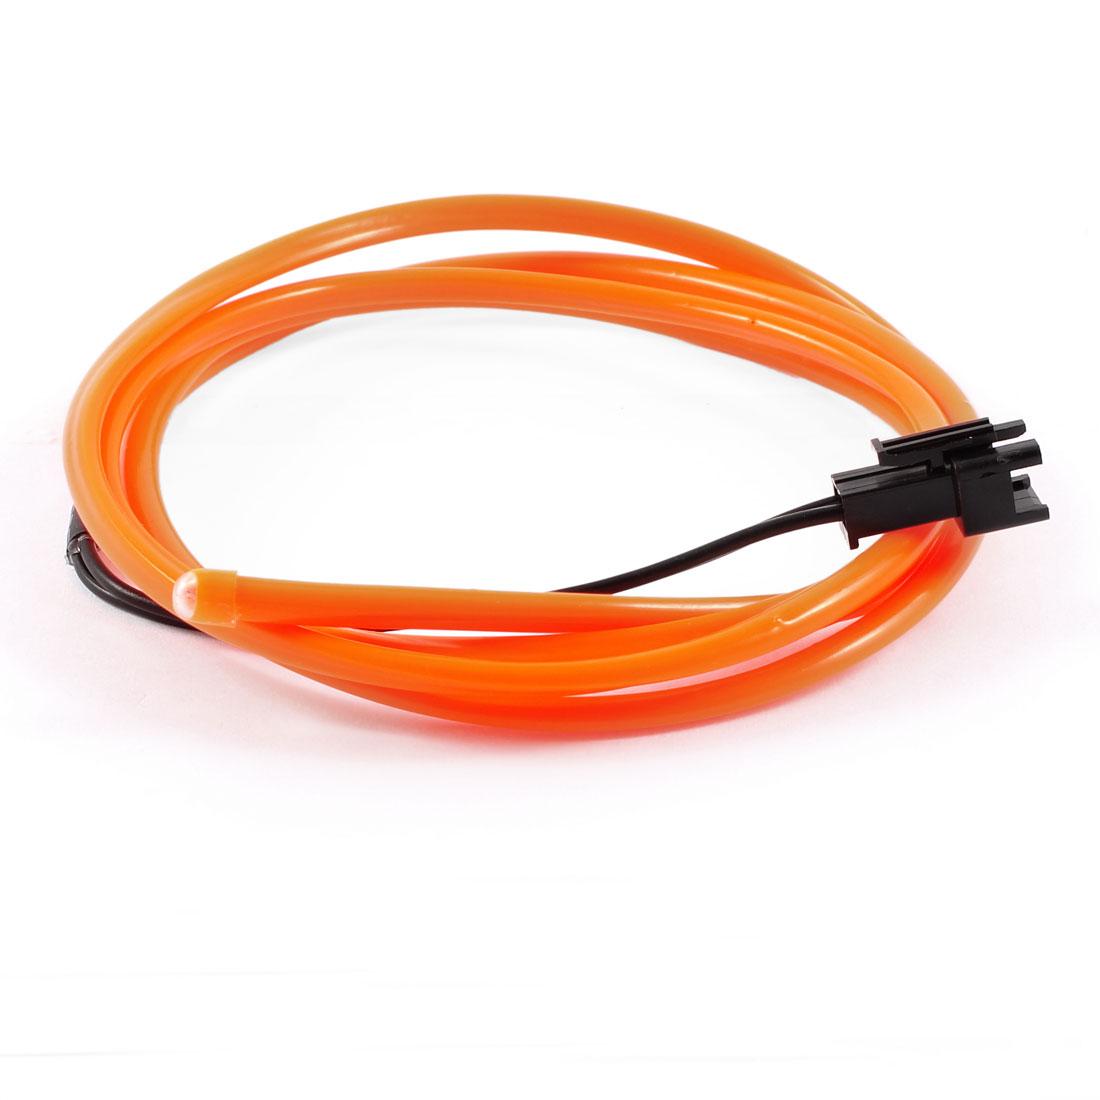 1M Long 4mm Dia Orange Flexible EL Wire Neon Glow Light Lamp Rope